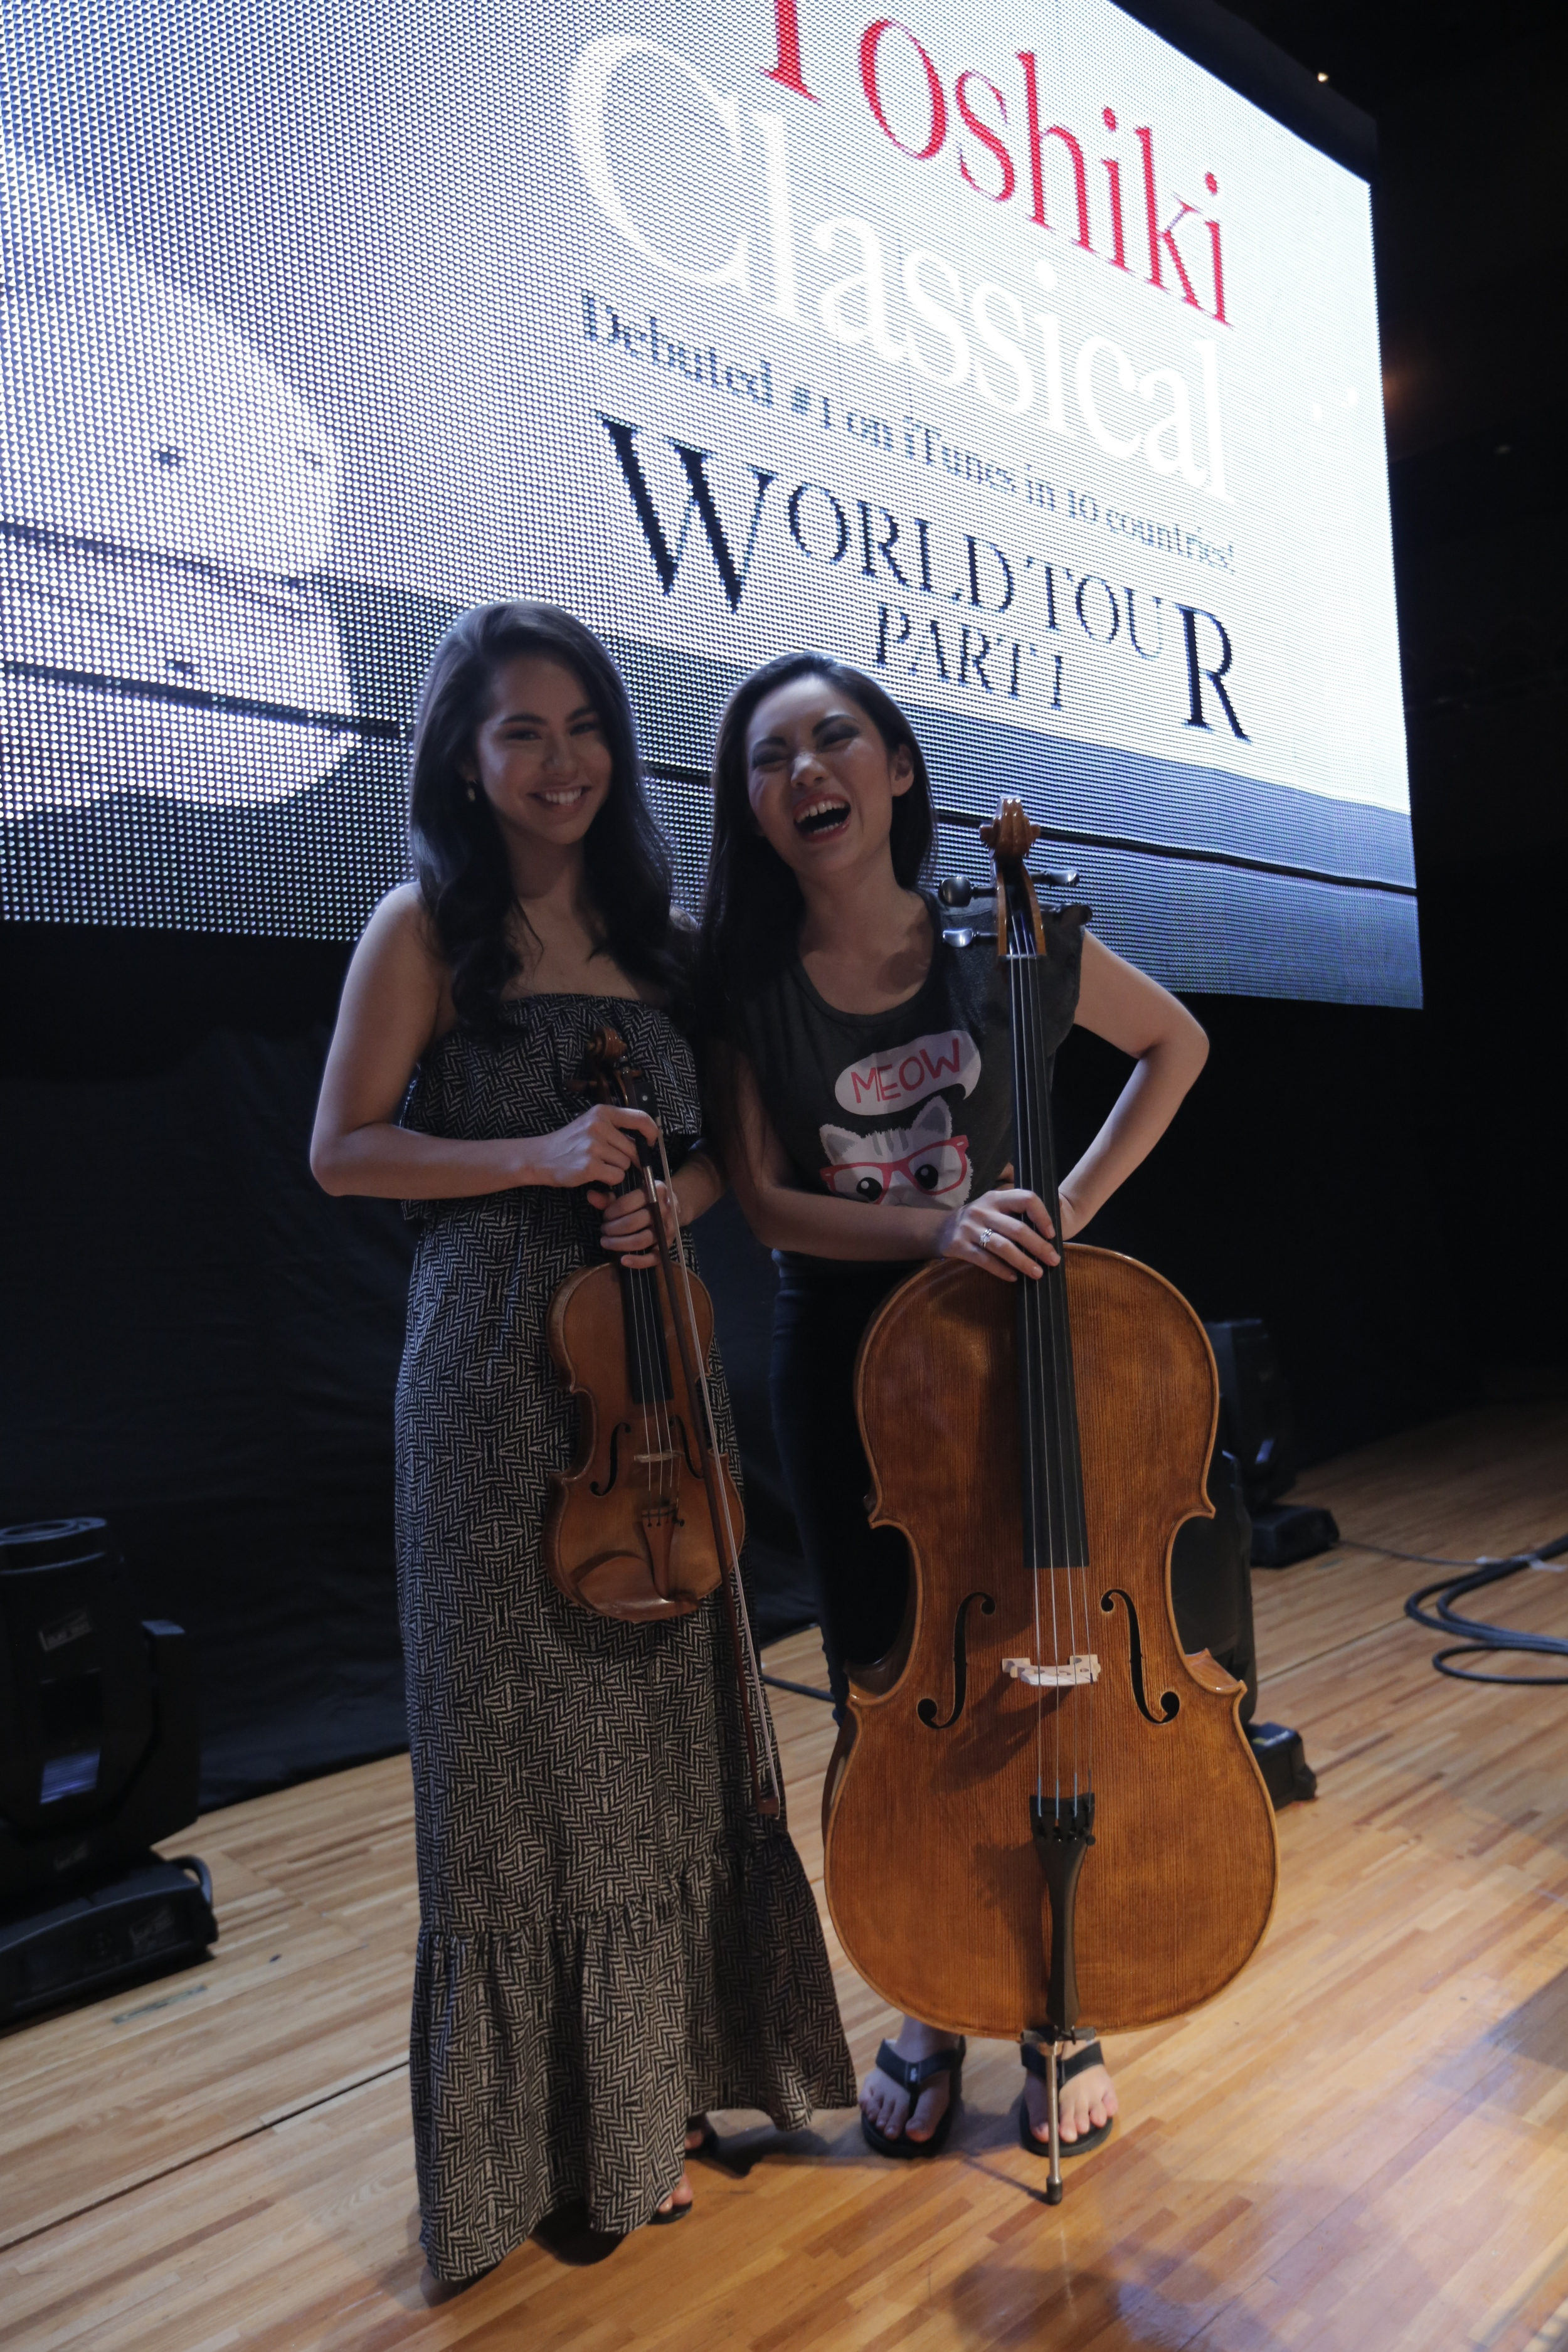 Post rehearsal for Yoshiki Classical World Tour  J une 2014  · Osaka, Japan